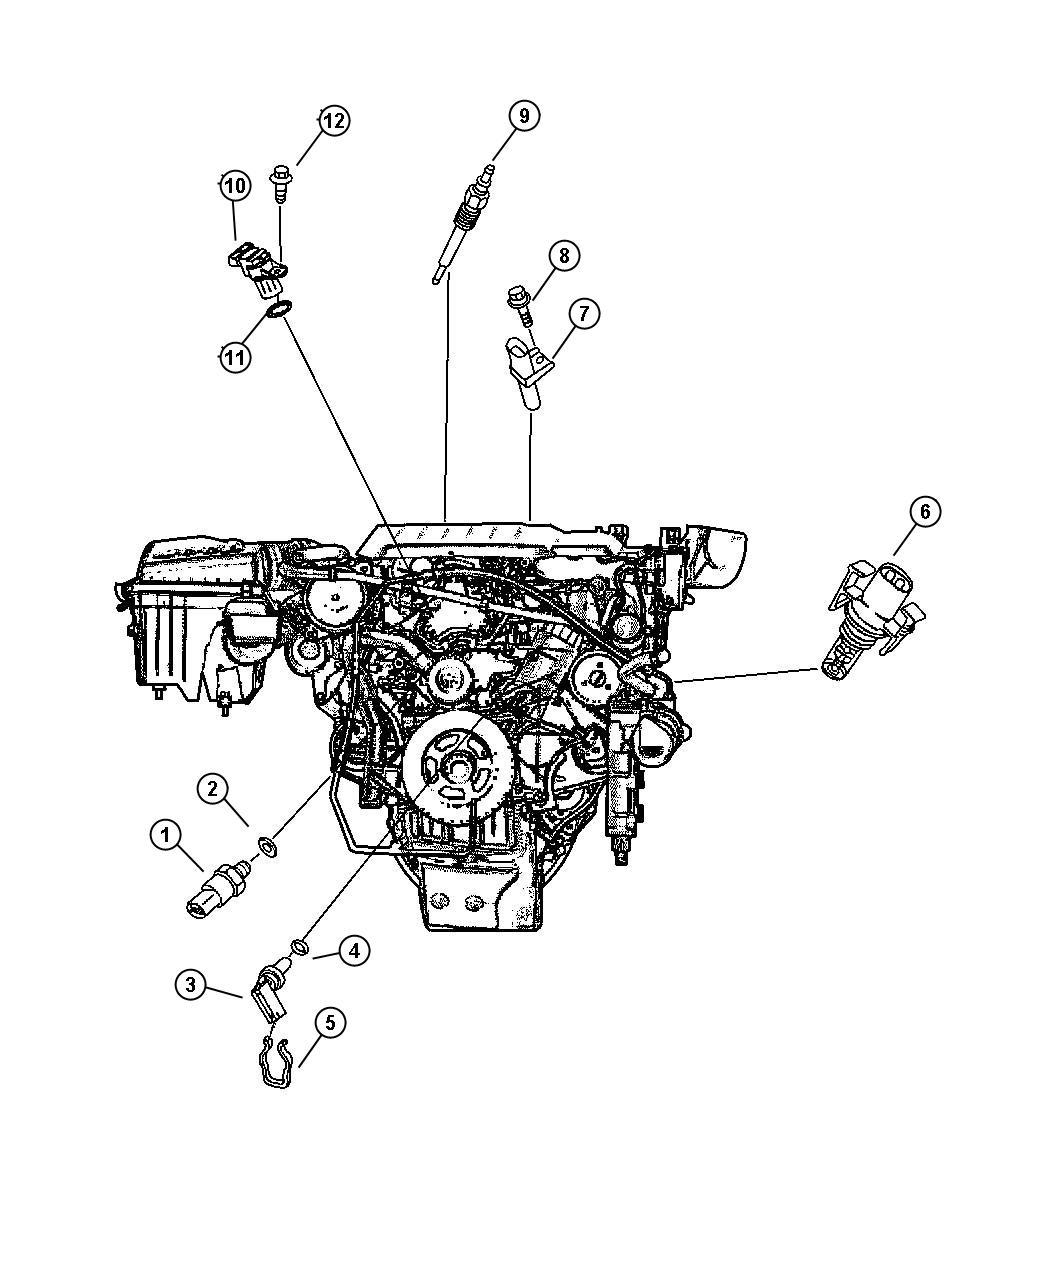 Dodge Caliber Srt4 2 4l 4 Cyl Dohc 16v Turbo 6 Speed